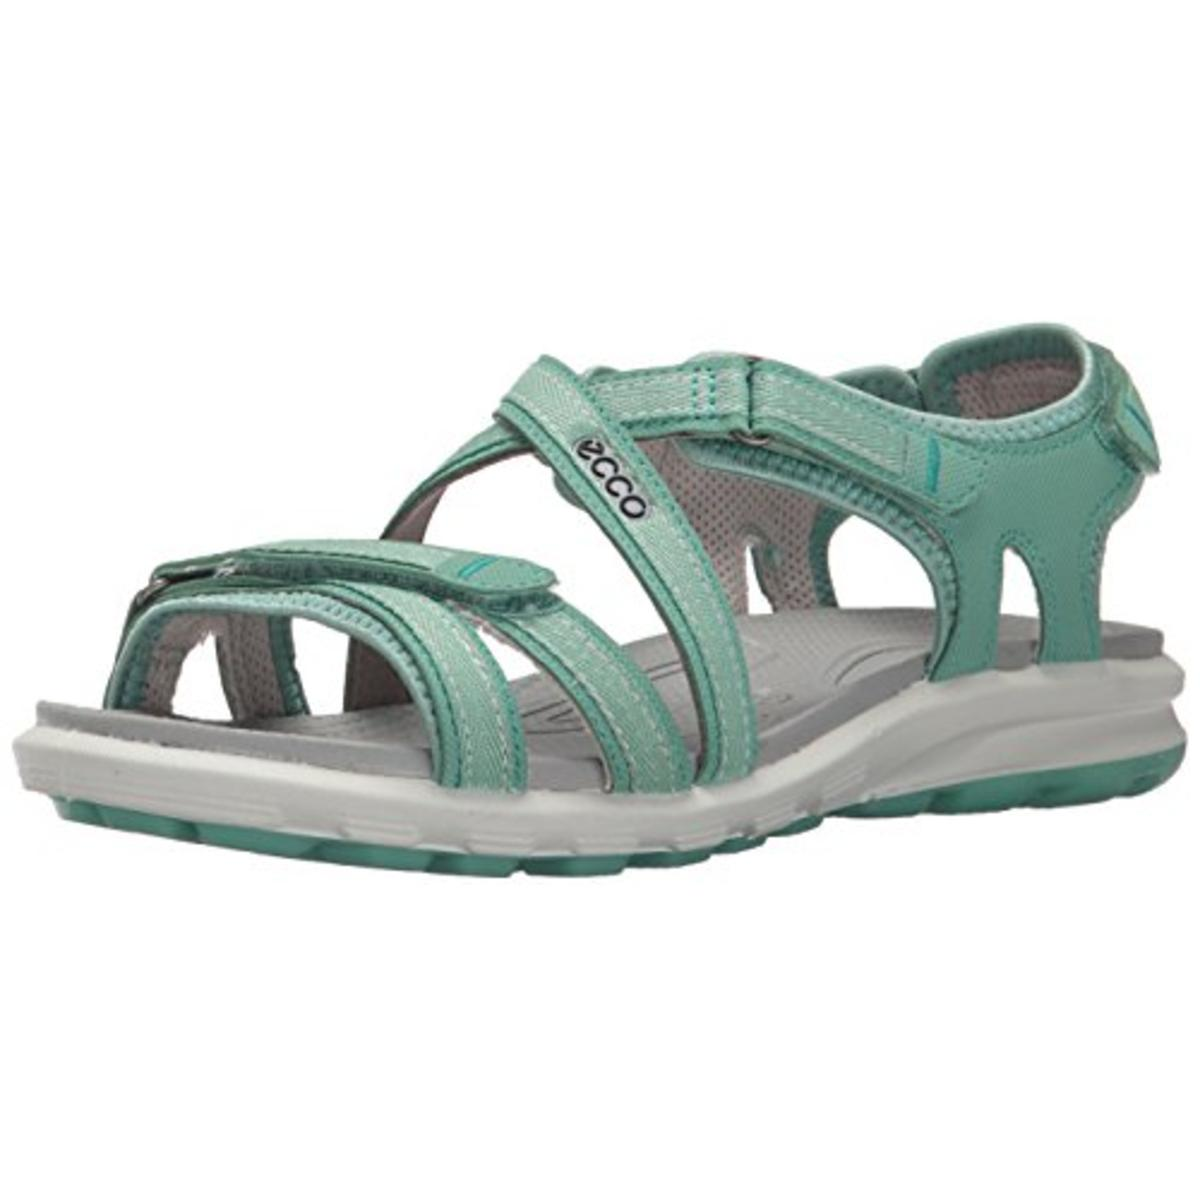 ECCO Womens Slingback Crisscross Strap Sport Sandals by Ecco